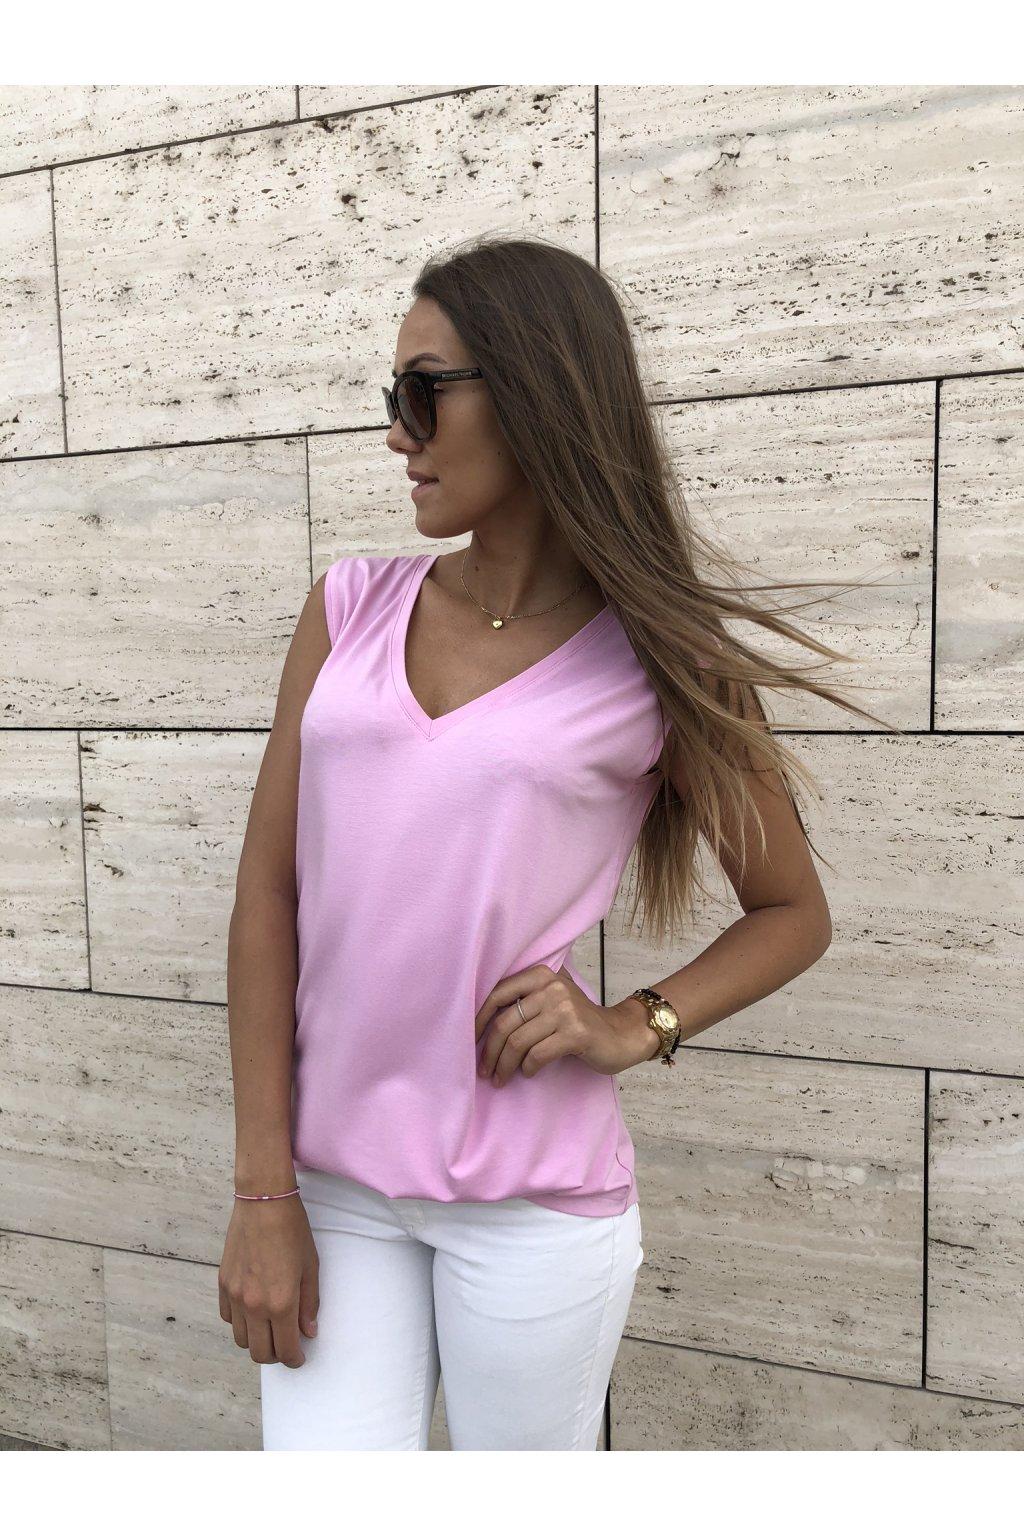 damske tilko bamboo classic v neck pink eshopat cz 1